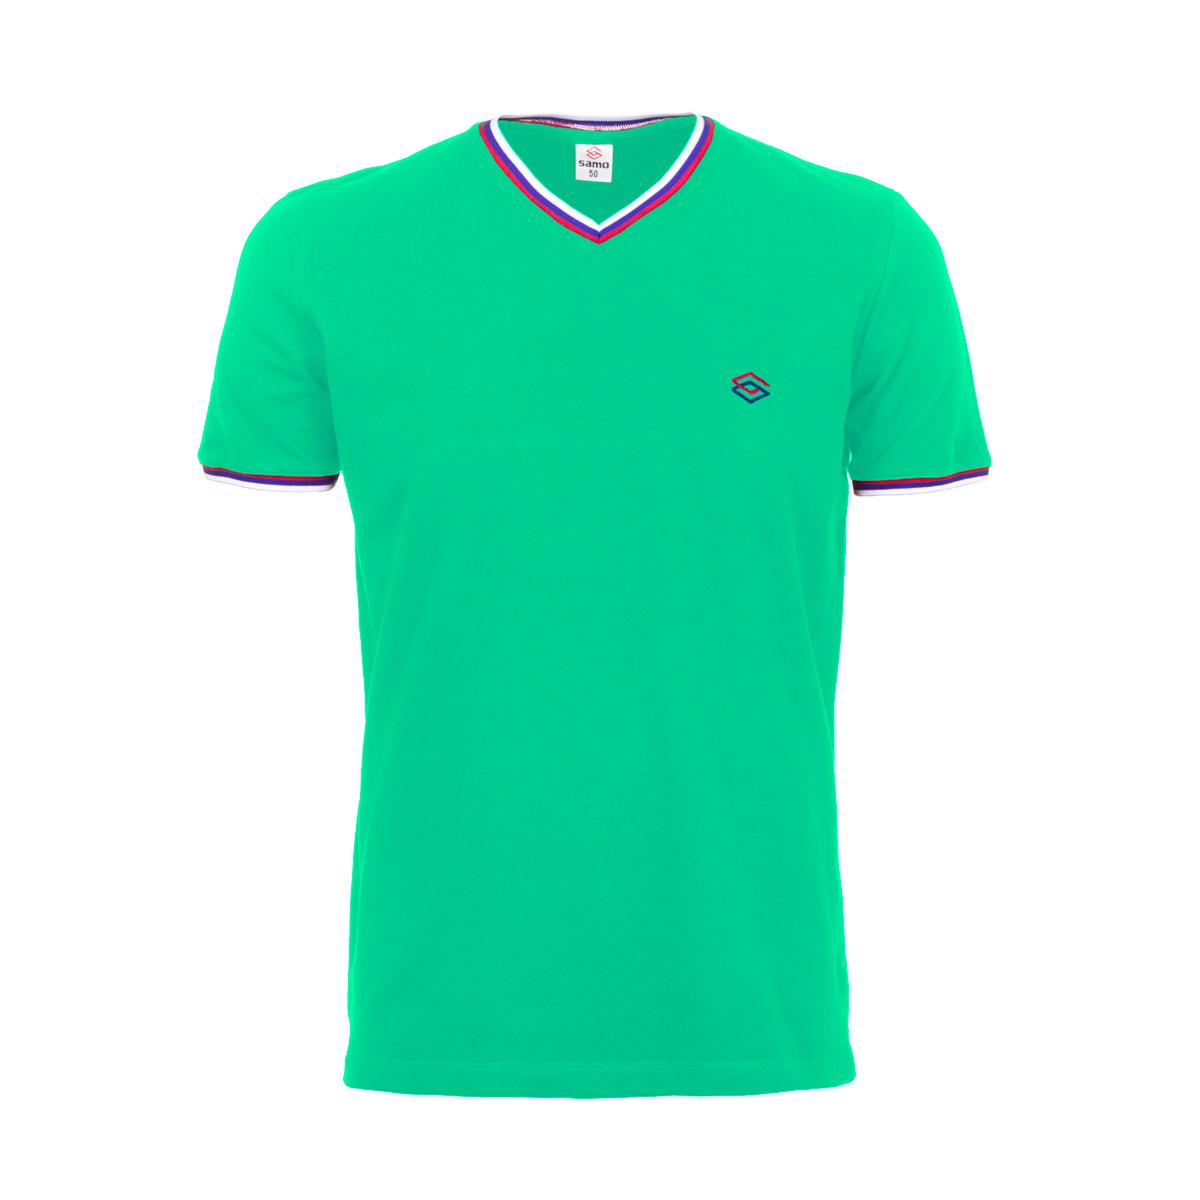 Муж. футболка арт. 04-0059 Ментол р. 56 - Мужская одежда артикул: 26319